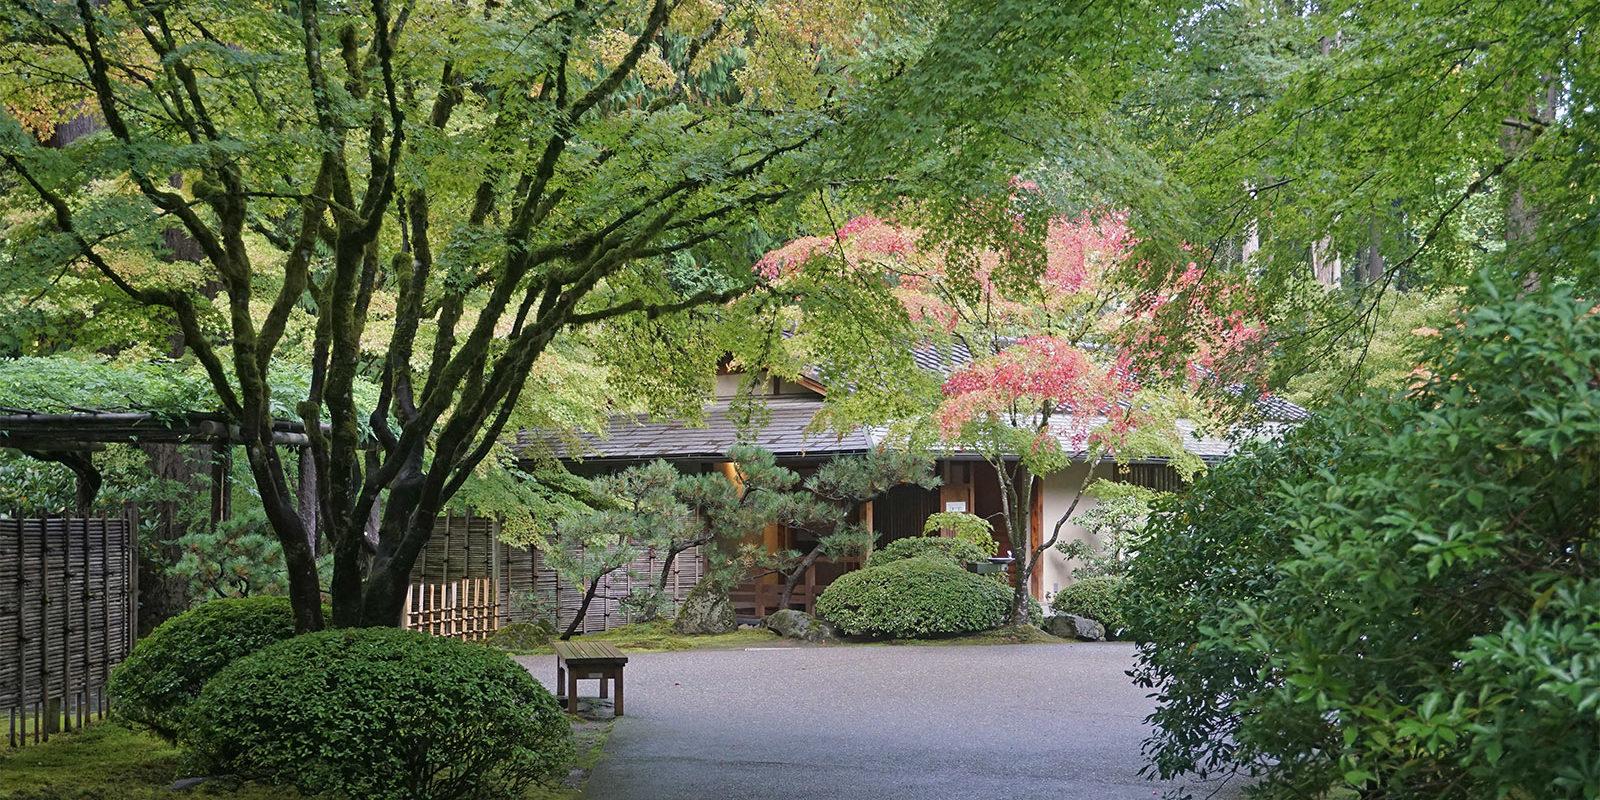 Portland Japanese Garden Early Fall Colors by Tyler Quinn - 2018-10-09 - DSC00960_low